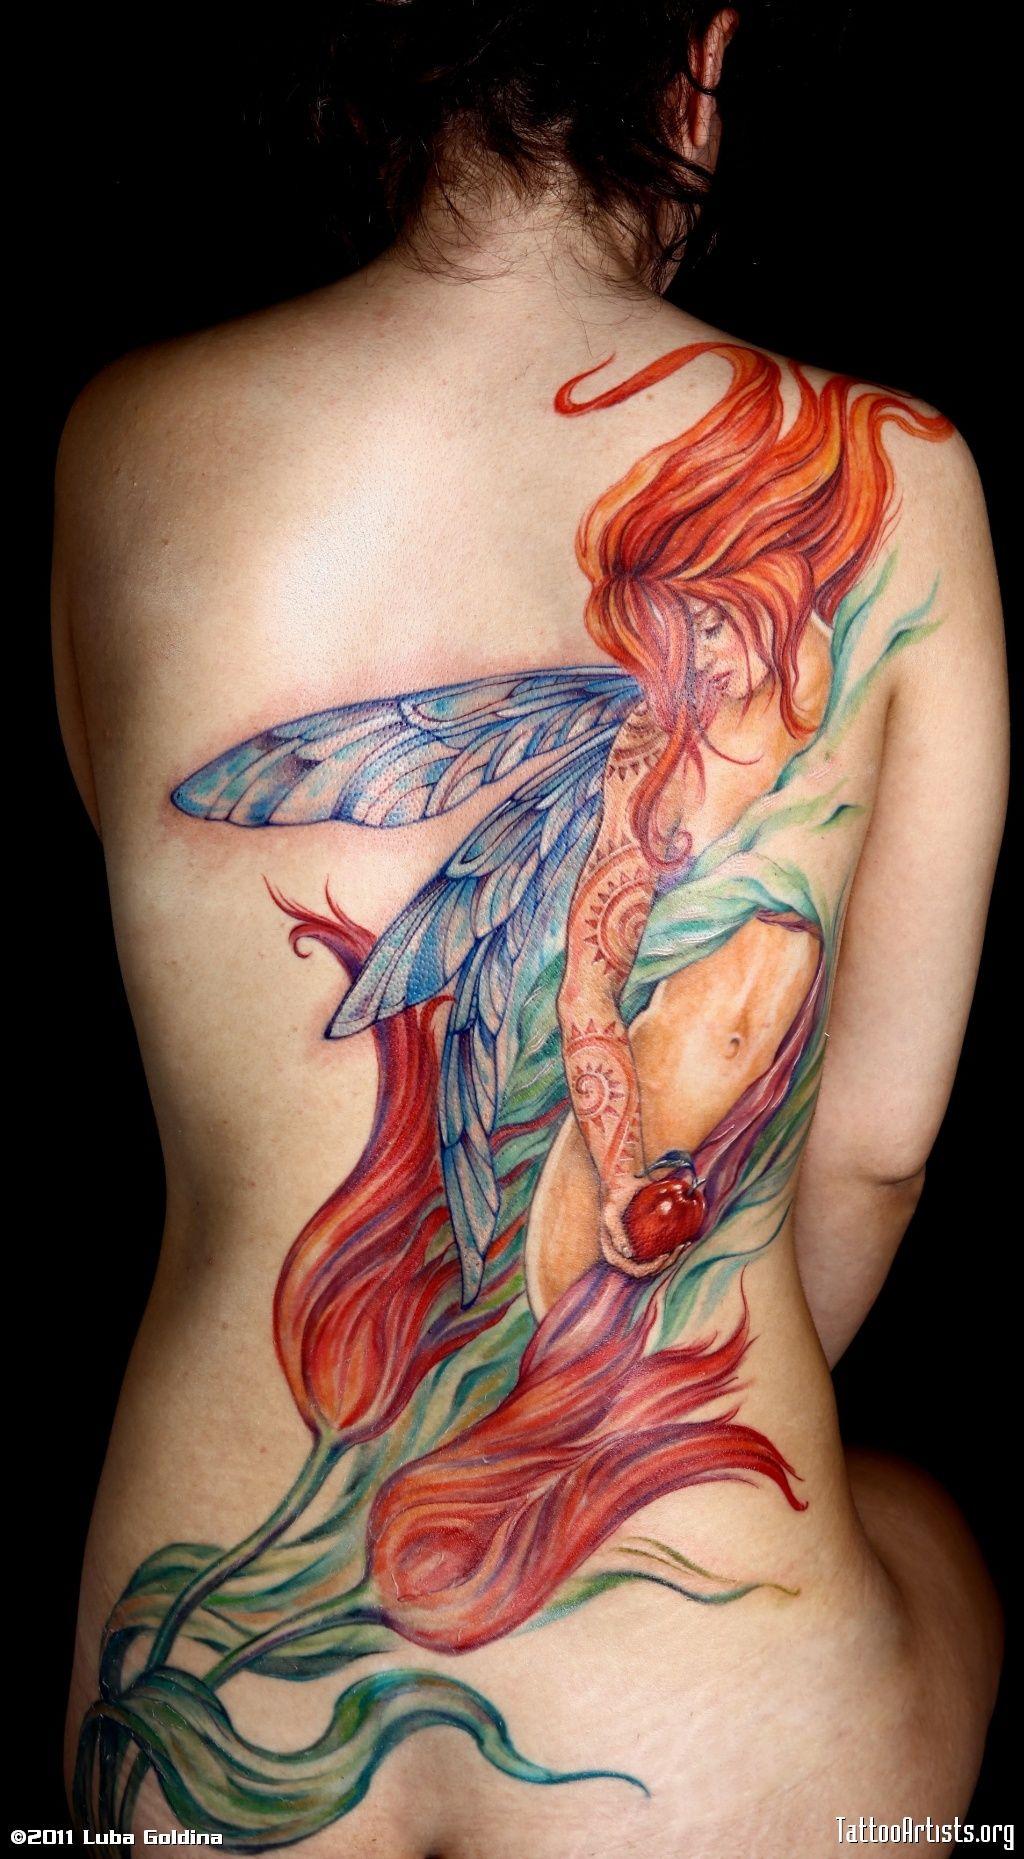 Tattoo ideas back piece pin by susan tait on body art  pinterest  fairy tattoo and tatting